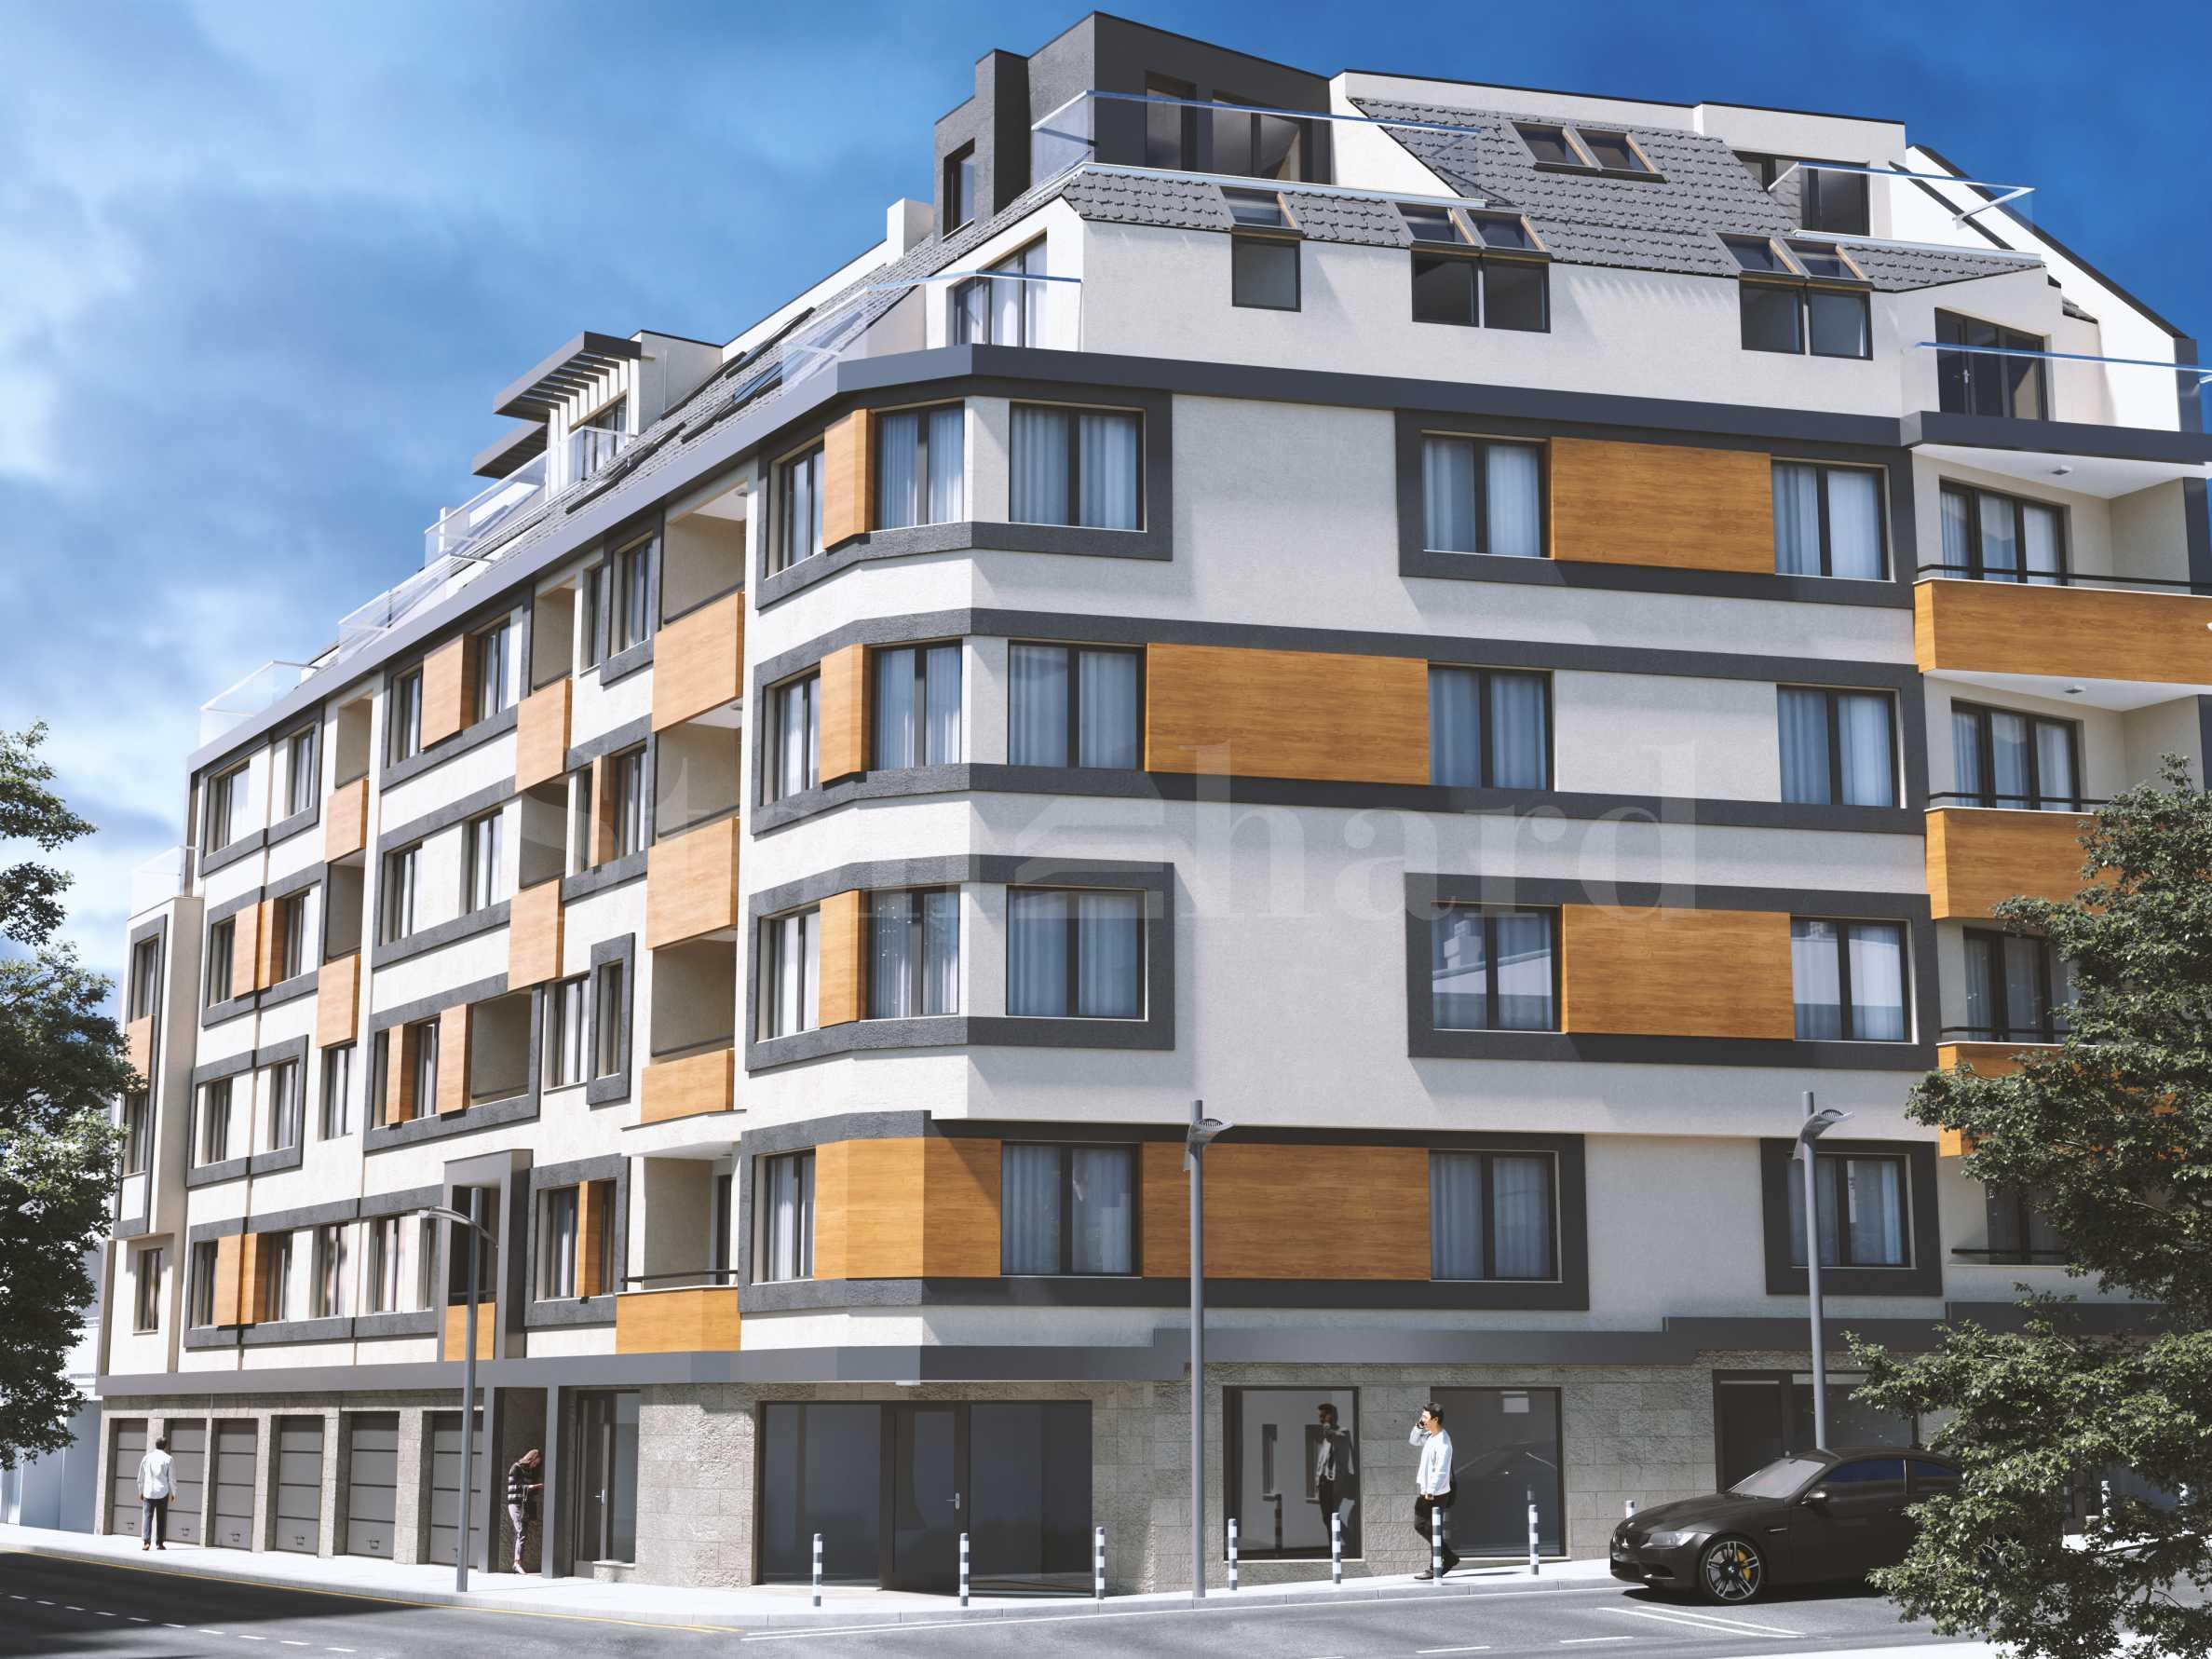 Нови апартаменти, гаражи и паркоместа близо до центъра1 - Stonehard